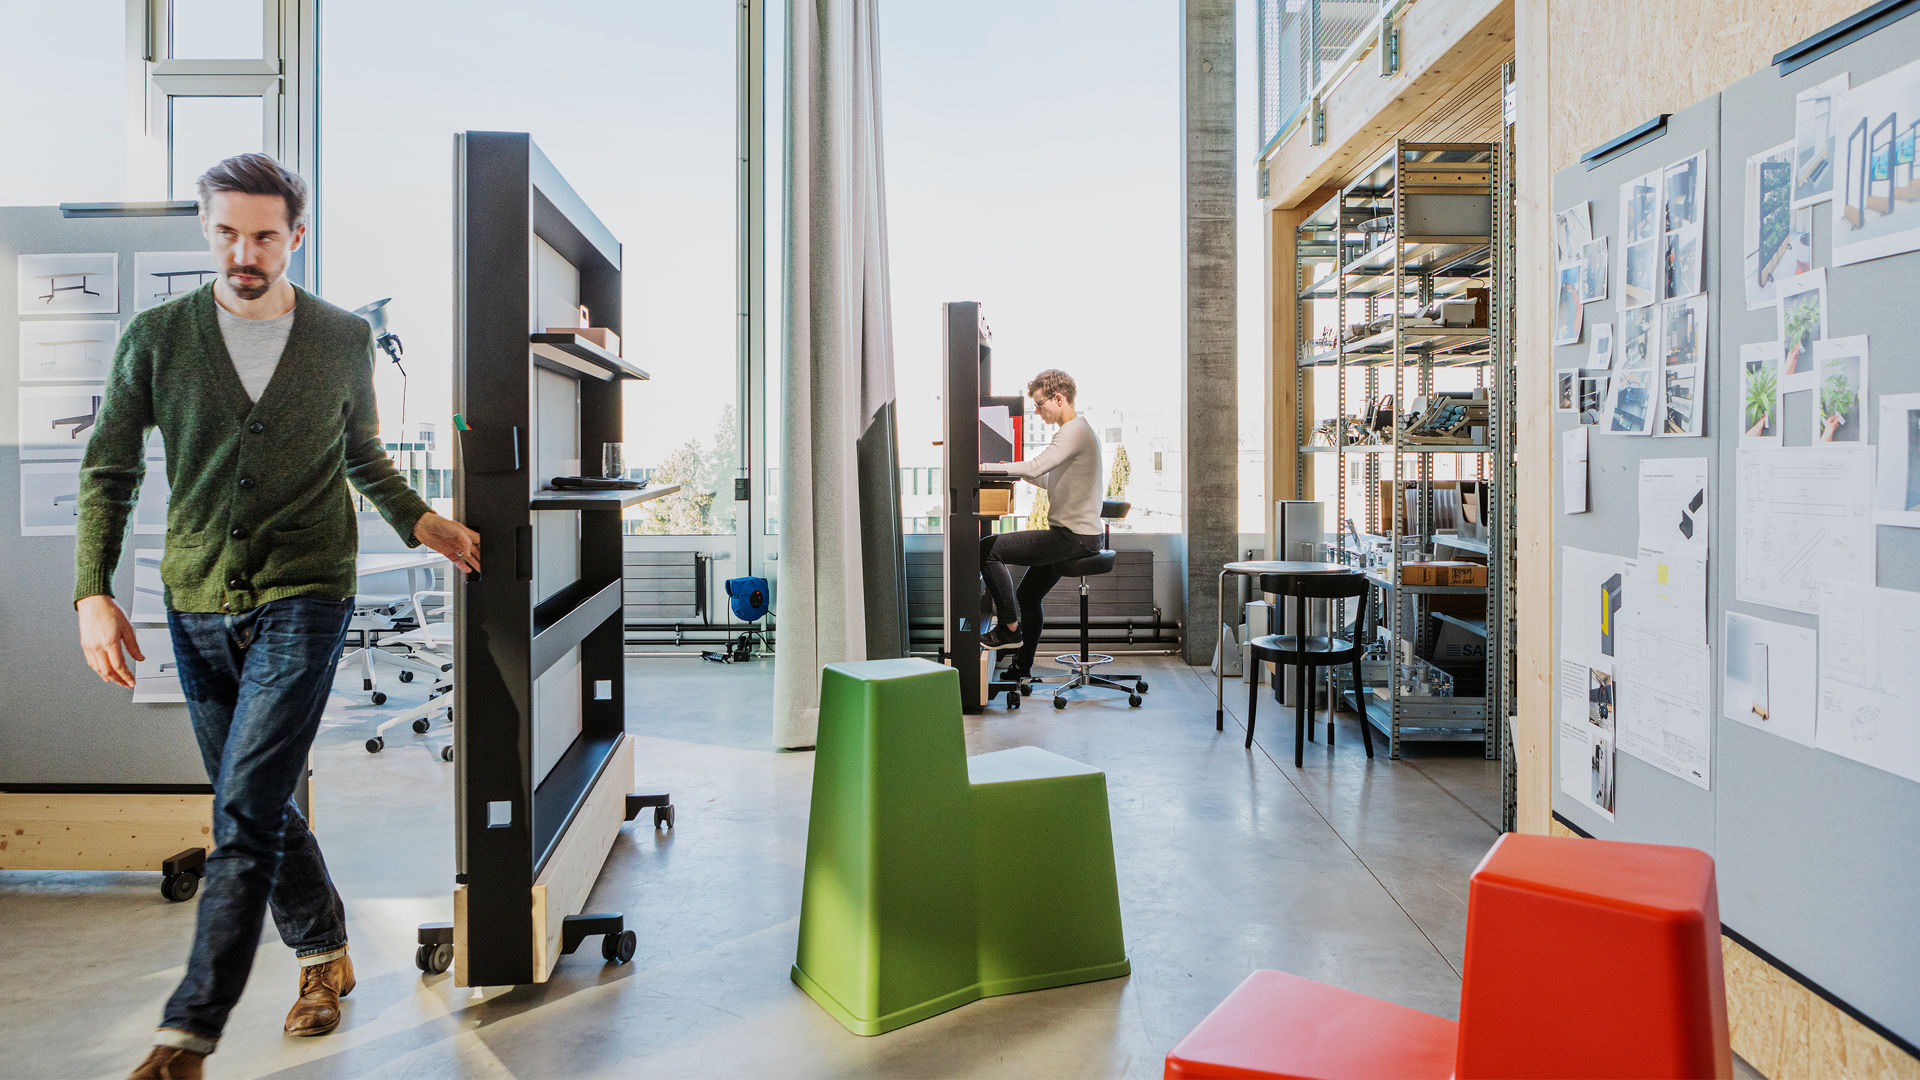 The_Dancing_Office_Studio Hürlemann_0514_web_16-9